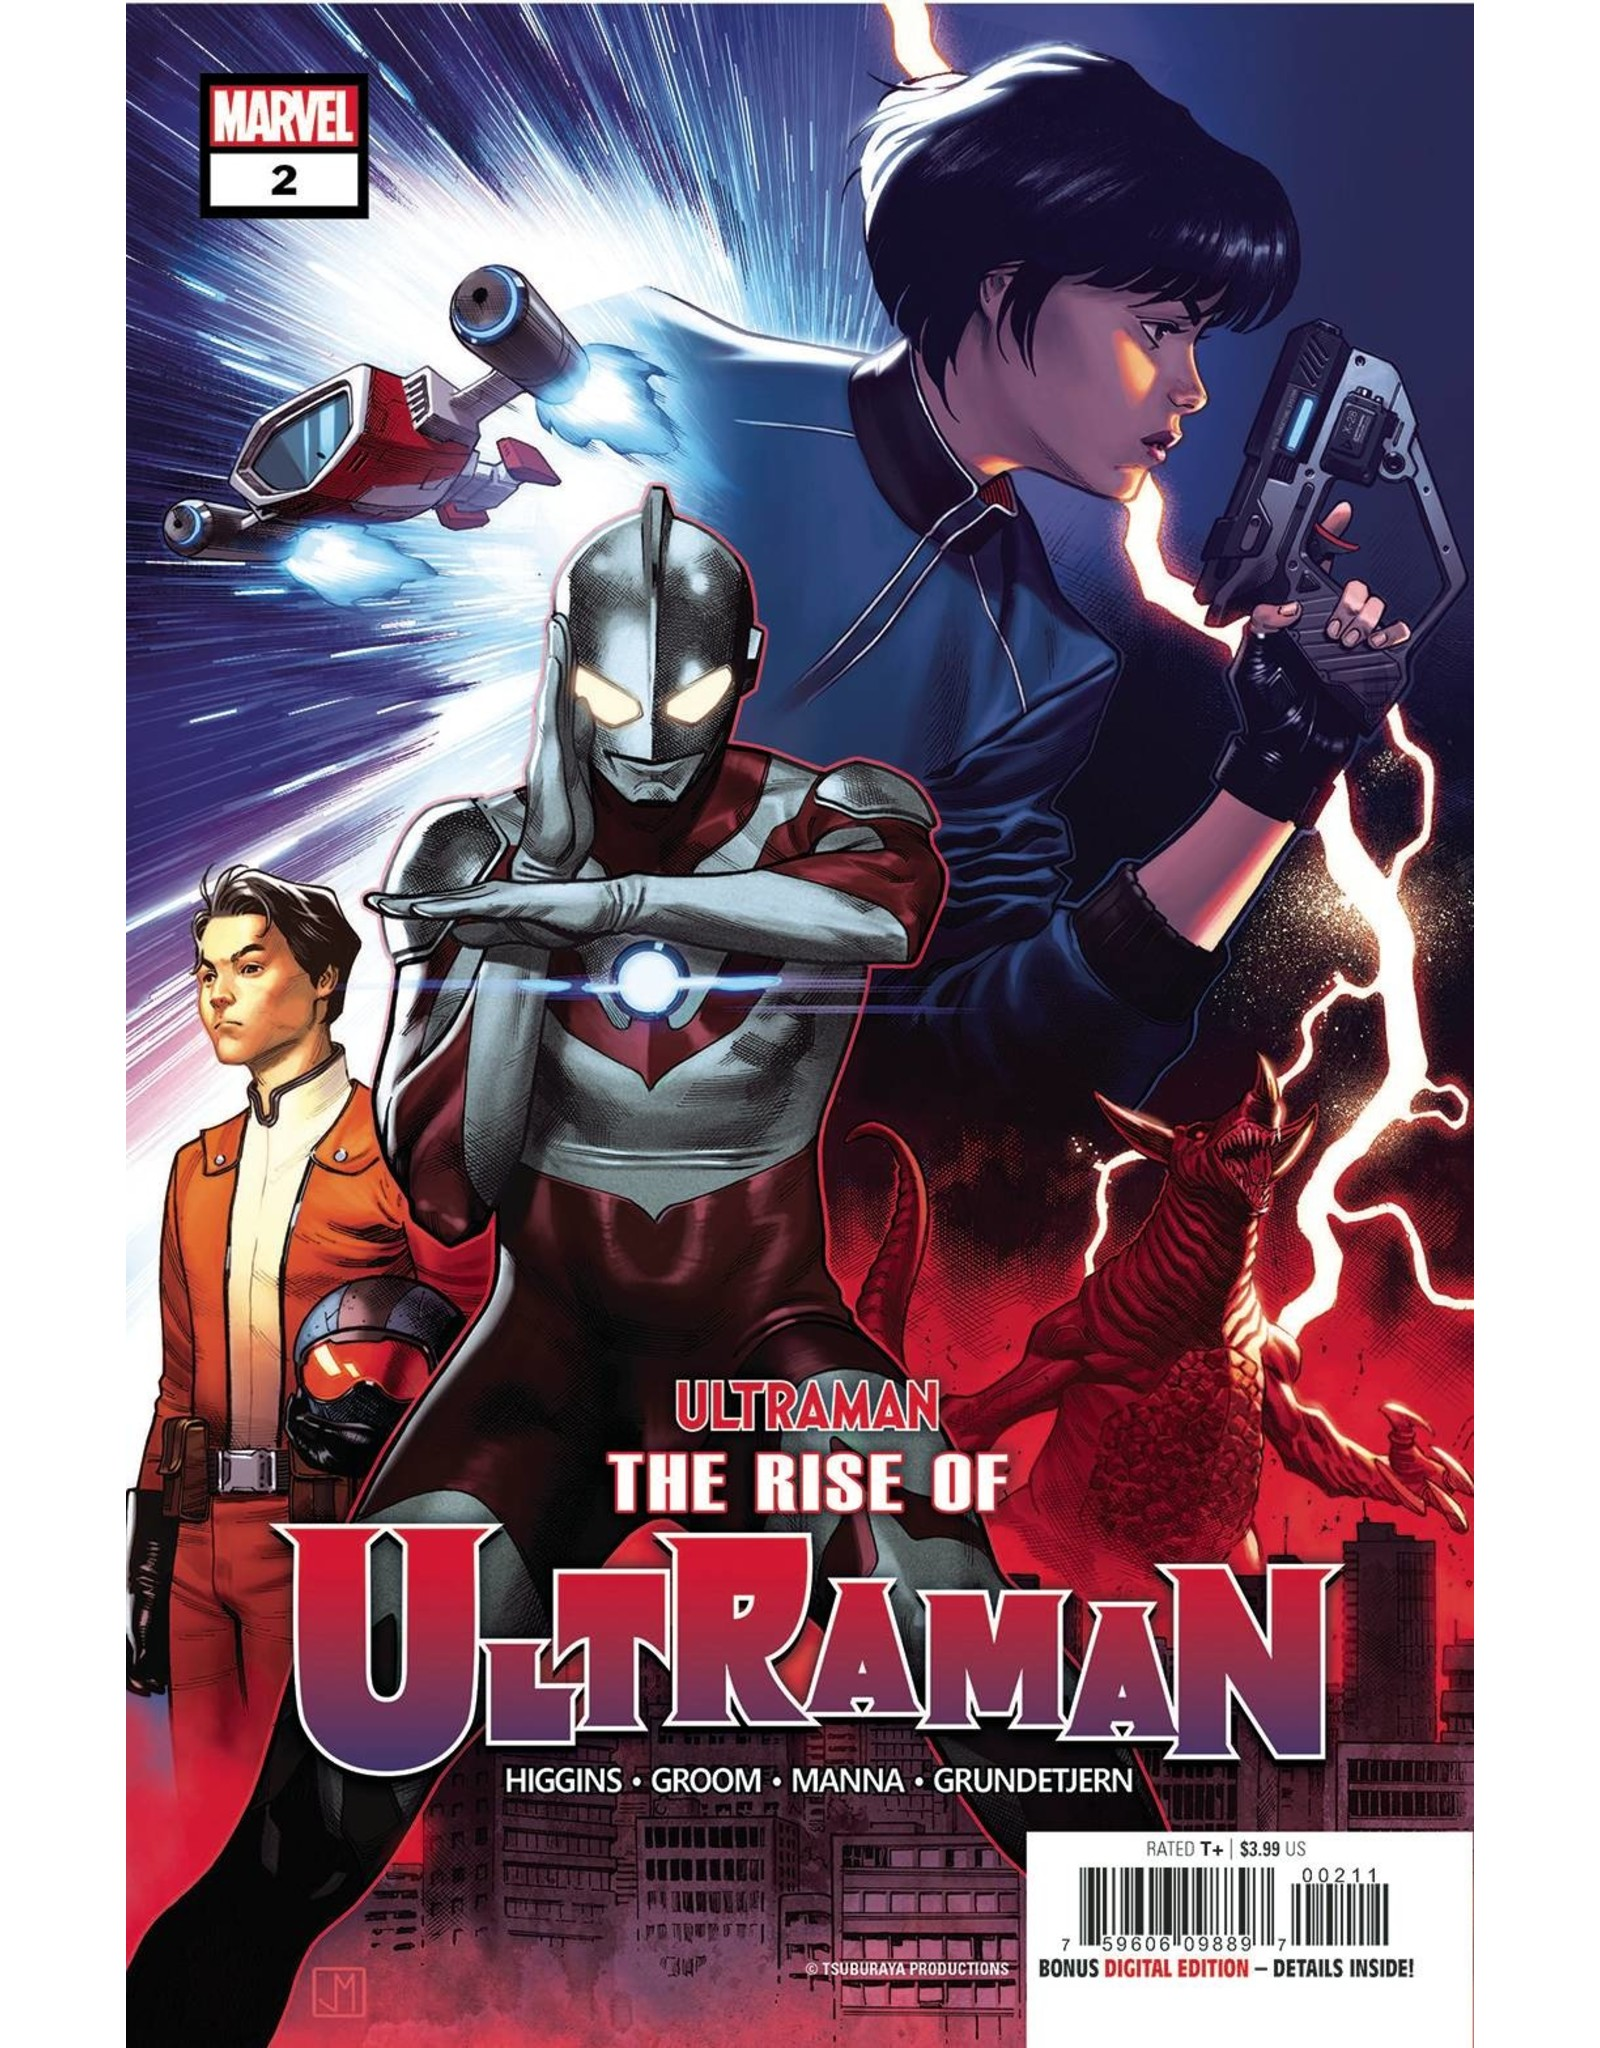 MARVEL COMICS RISE OF ULTRAMAN #2 (OF 5)